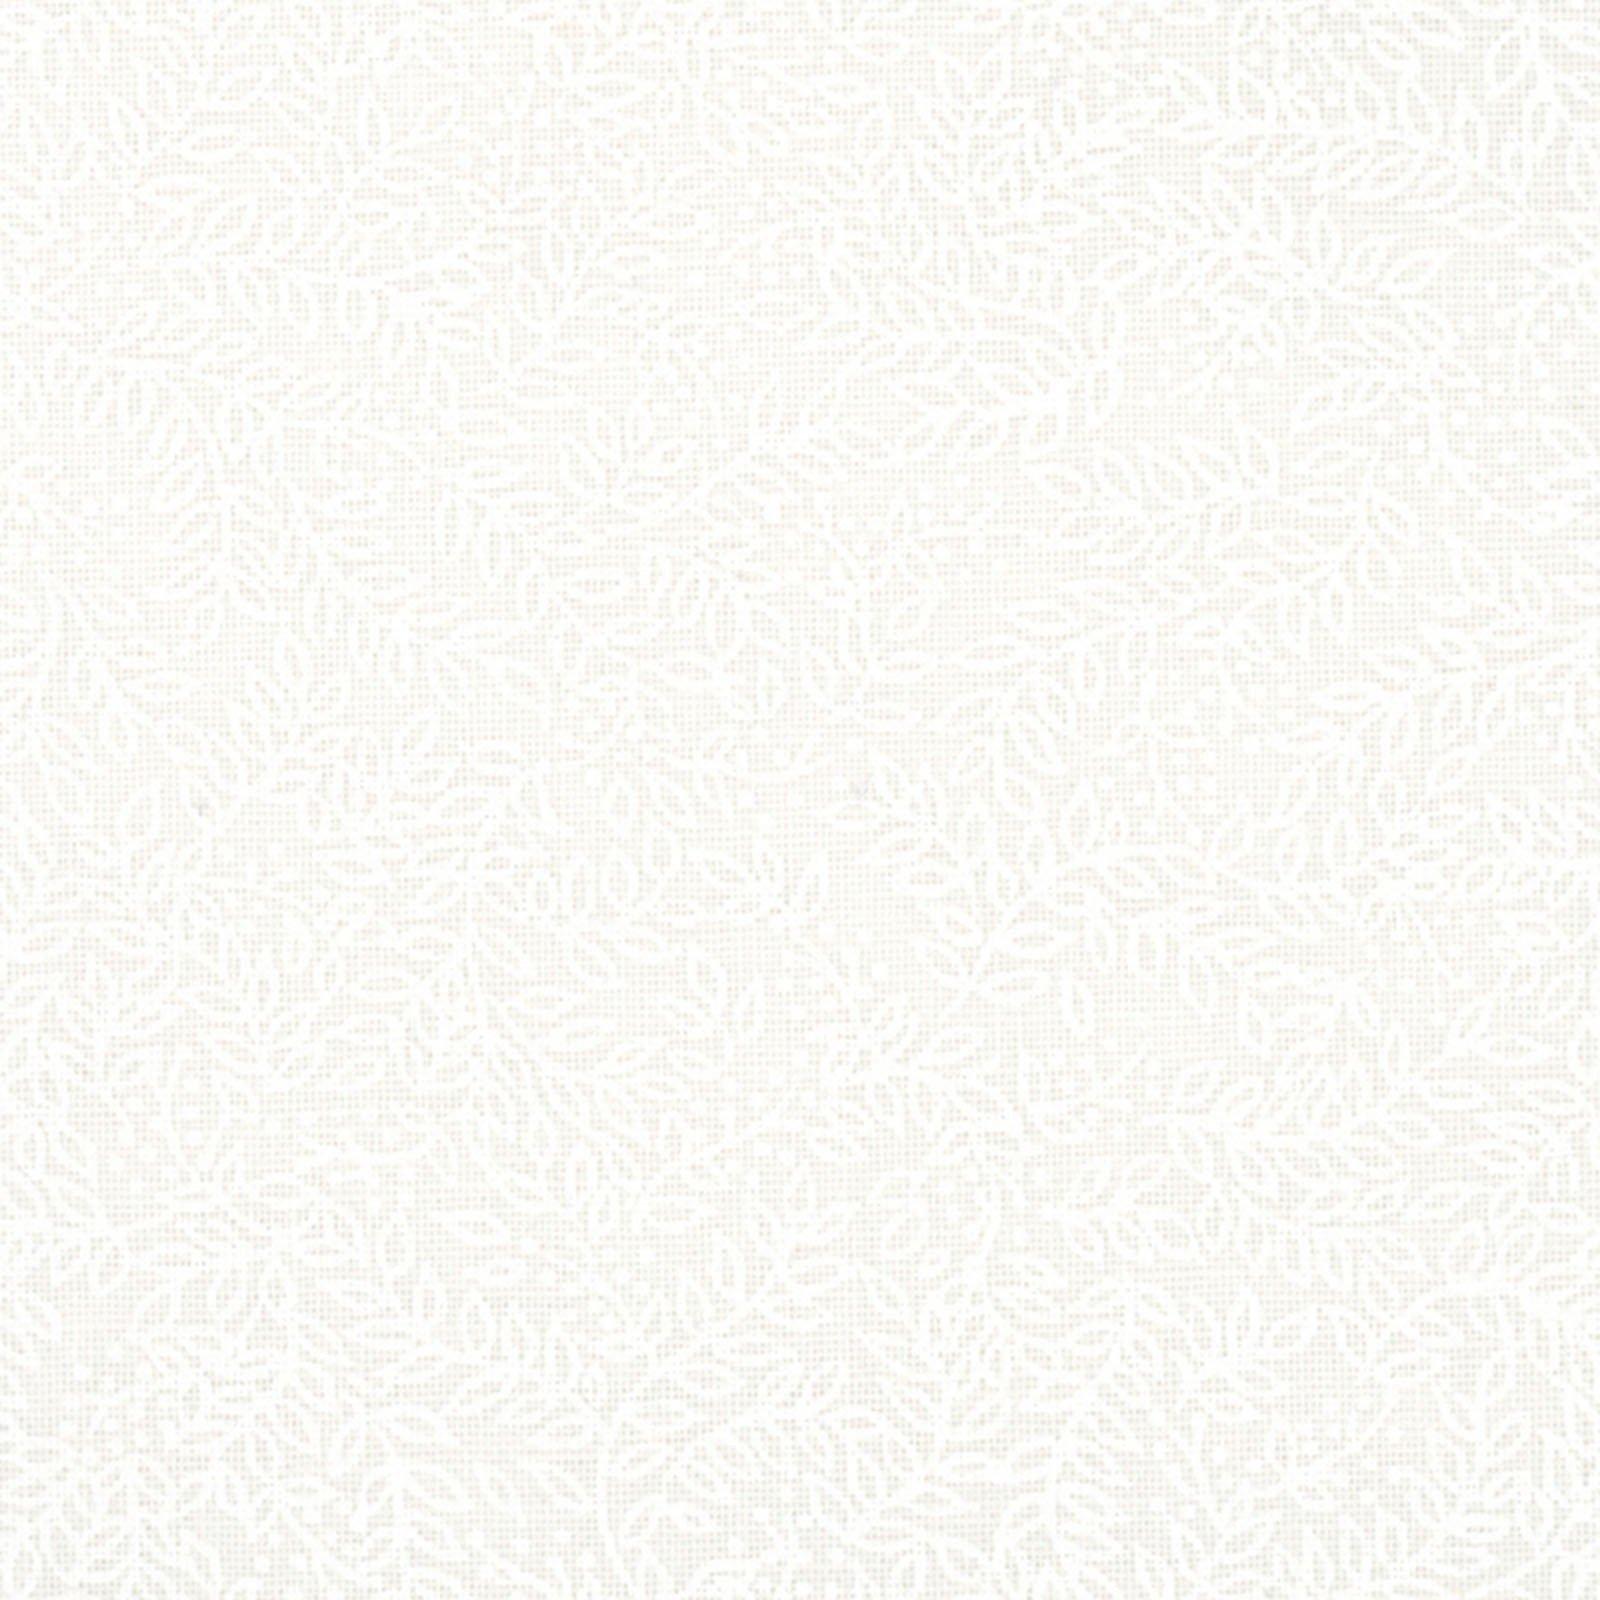 Quilter's Whites, GALQUW27267-WHI